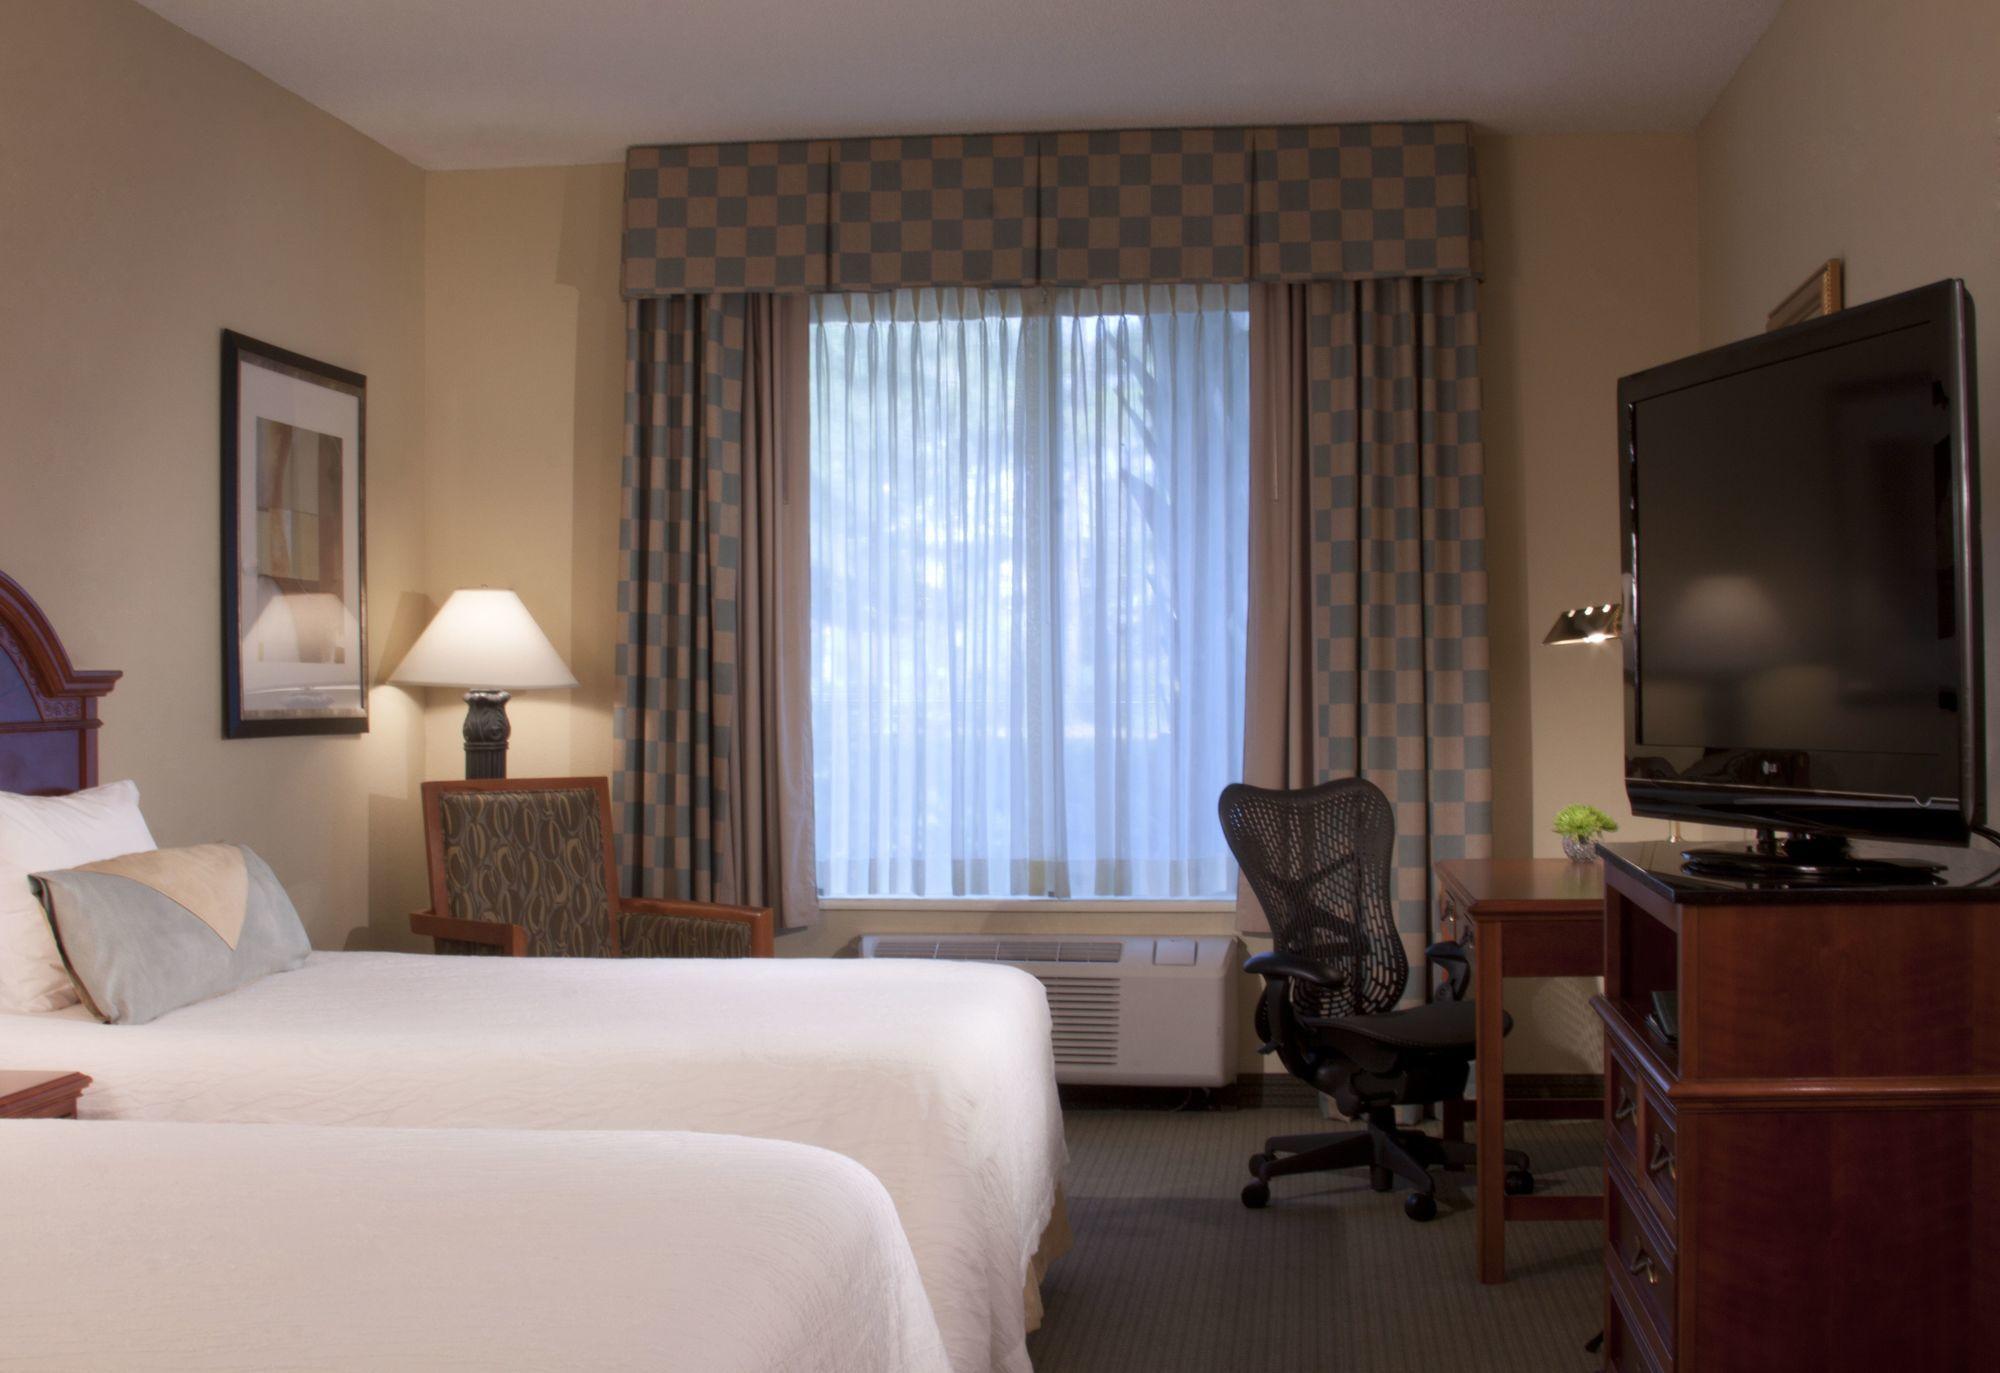 Discount Coupon For Hilton Garden Inn Jacksonville Jtb Deerwood Park In Jacksonville Florida